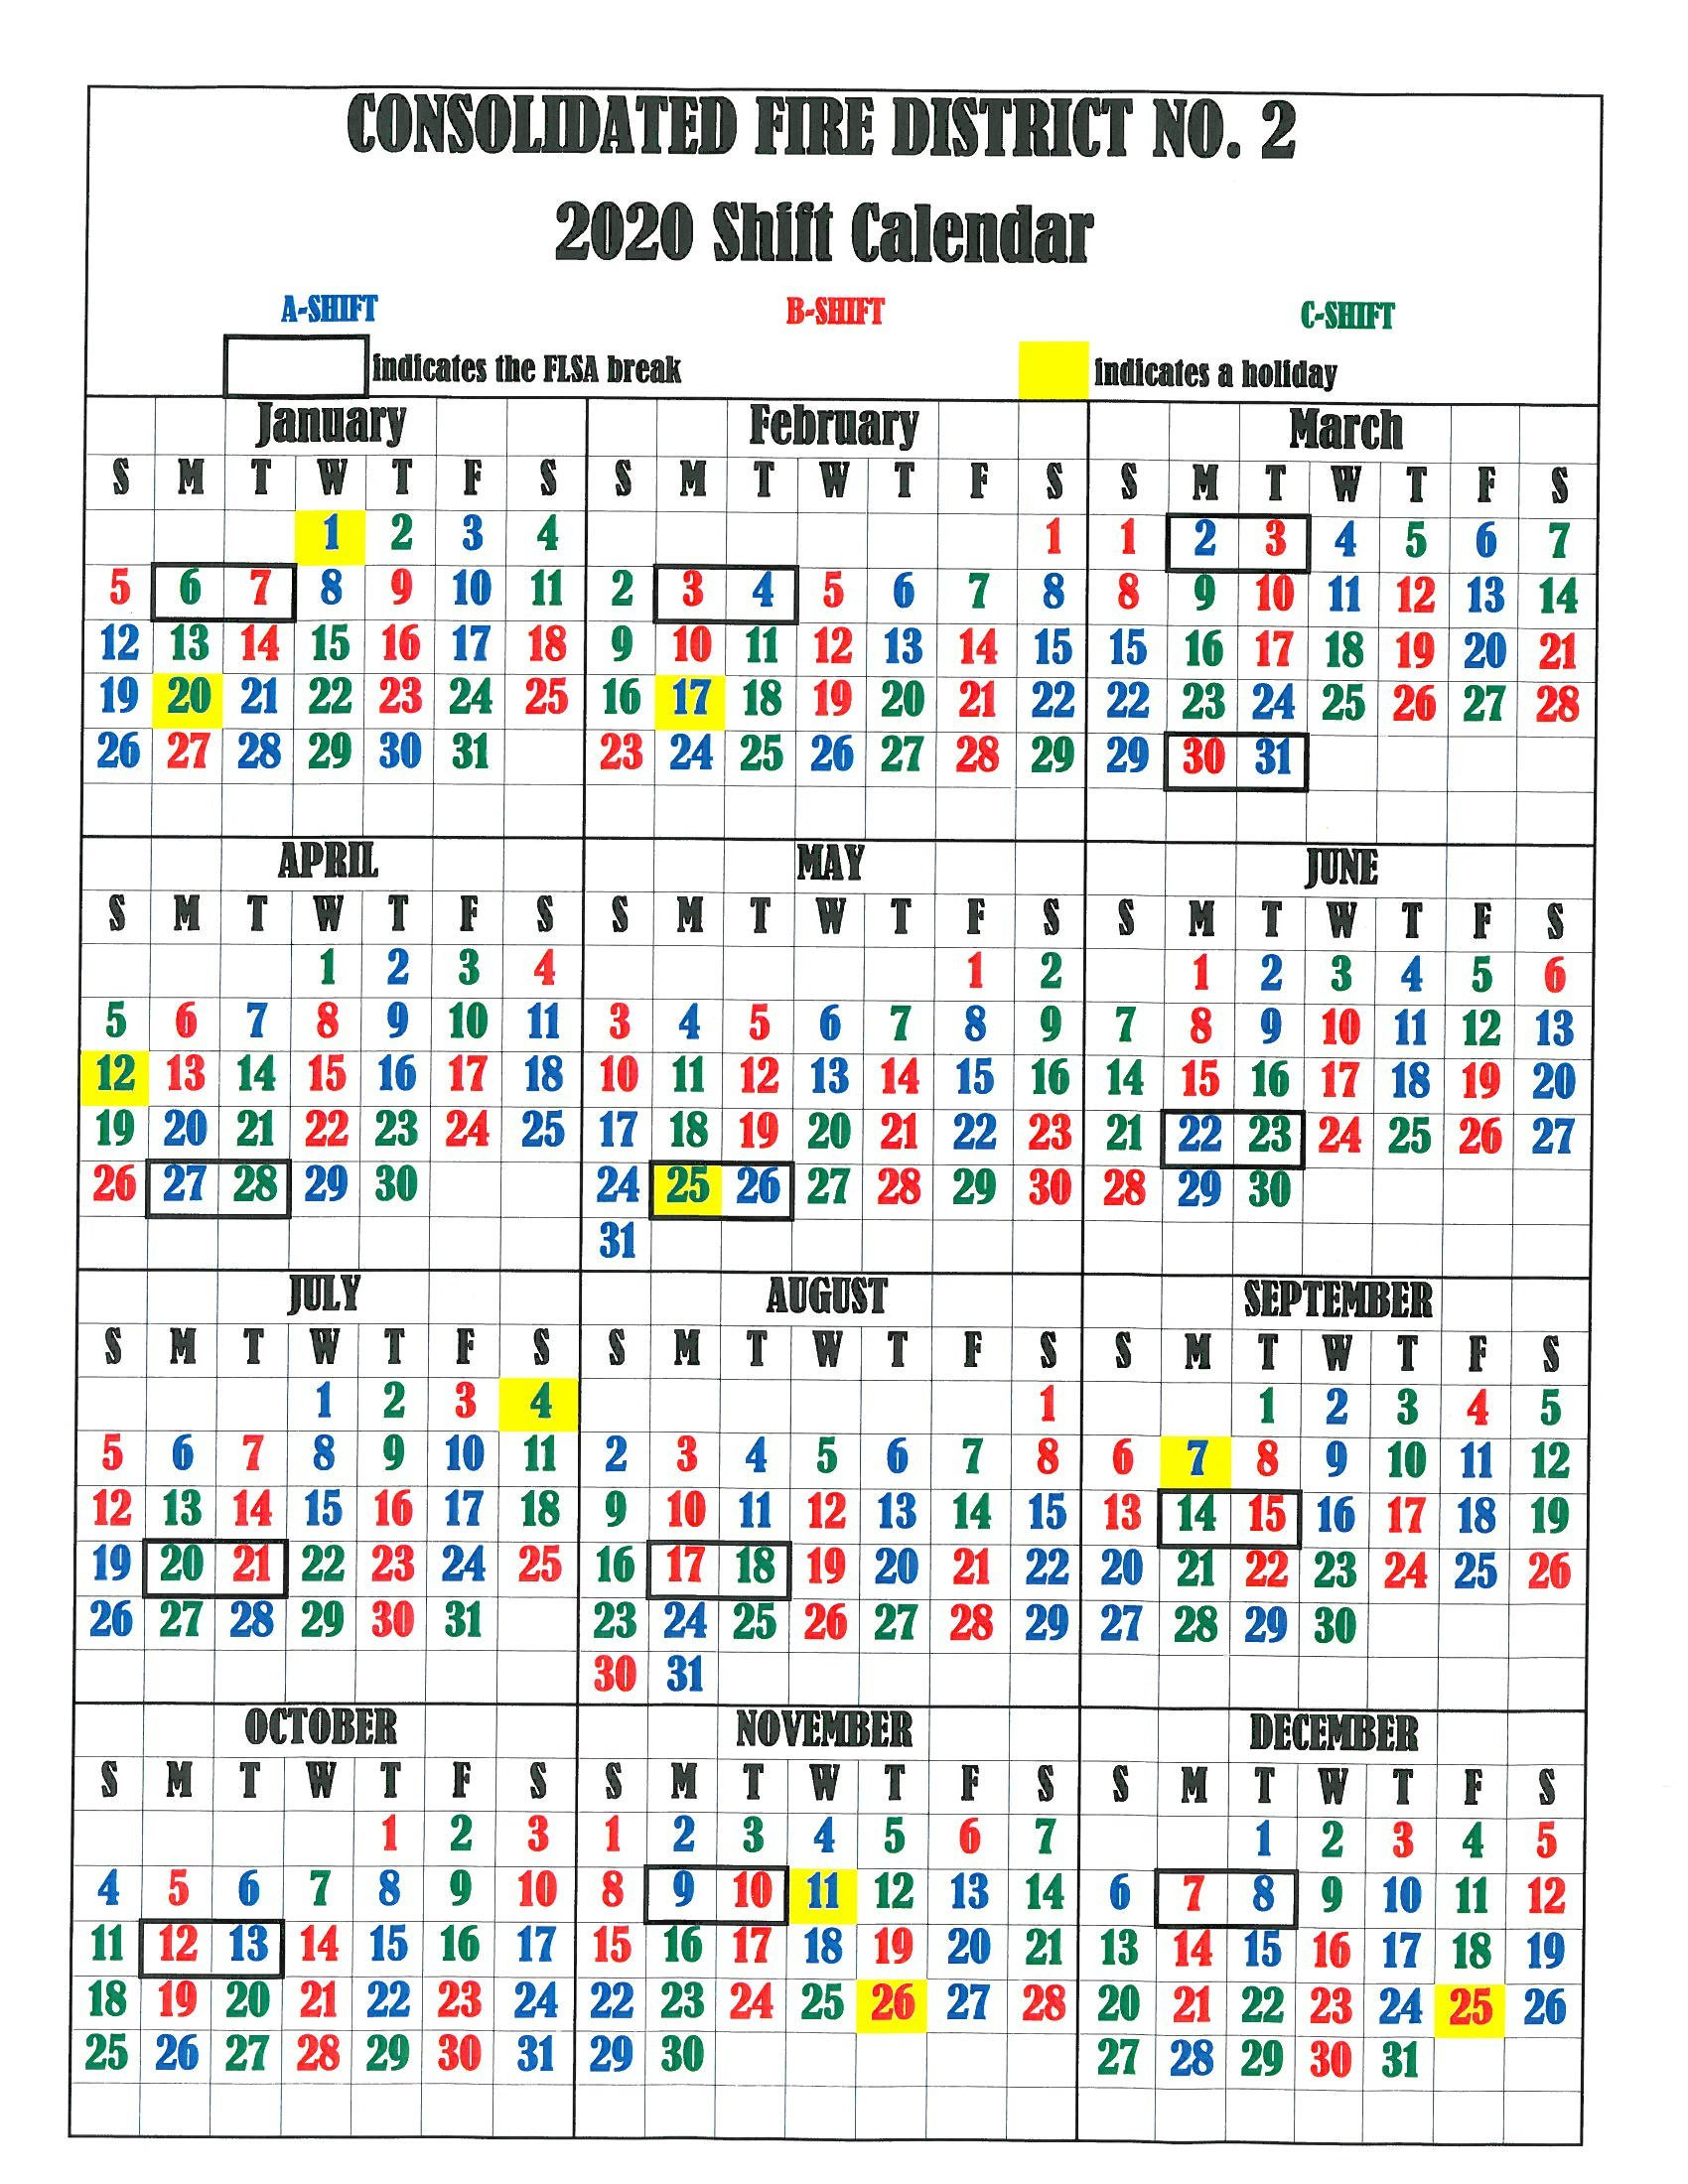 Firefighter Shift Calendar 2020 – Wpa.wpart.co For Firefighter Shift Schedule Tool